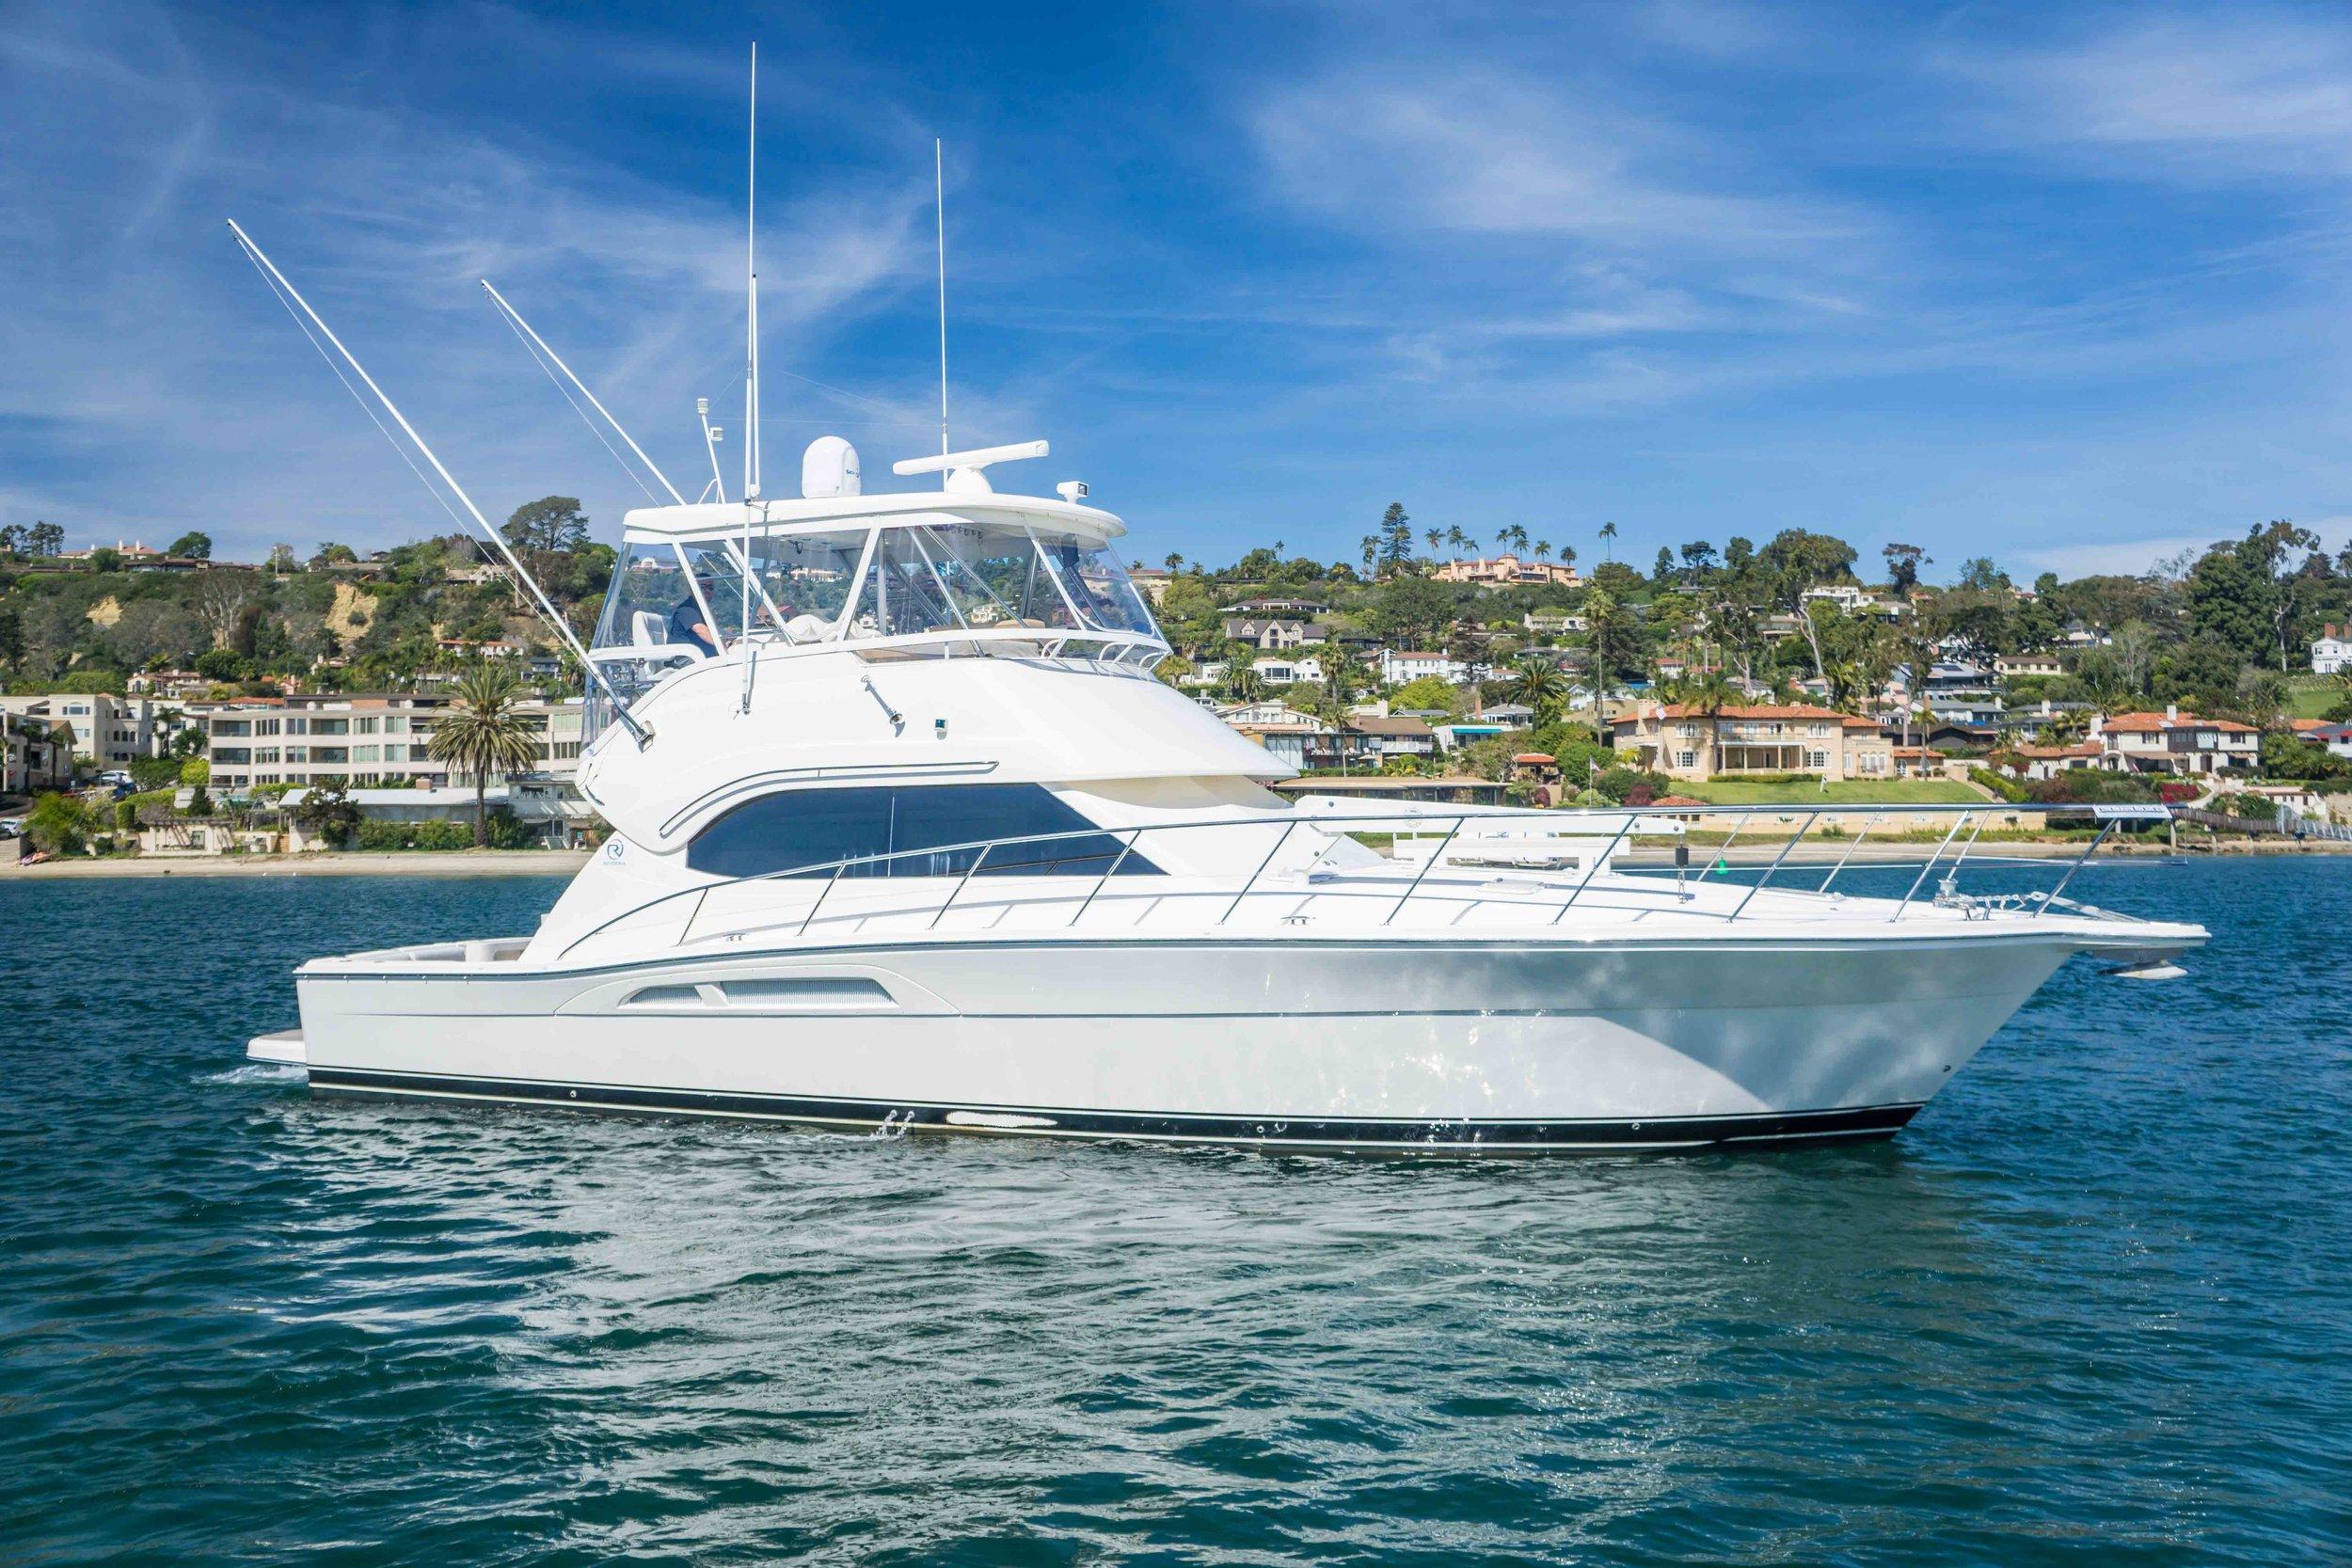 Kusler yachts san diego sport fishing boats luxury for Fishing boats for sale san diego